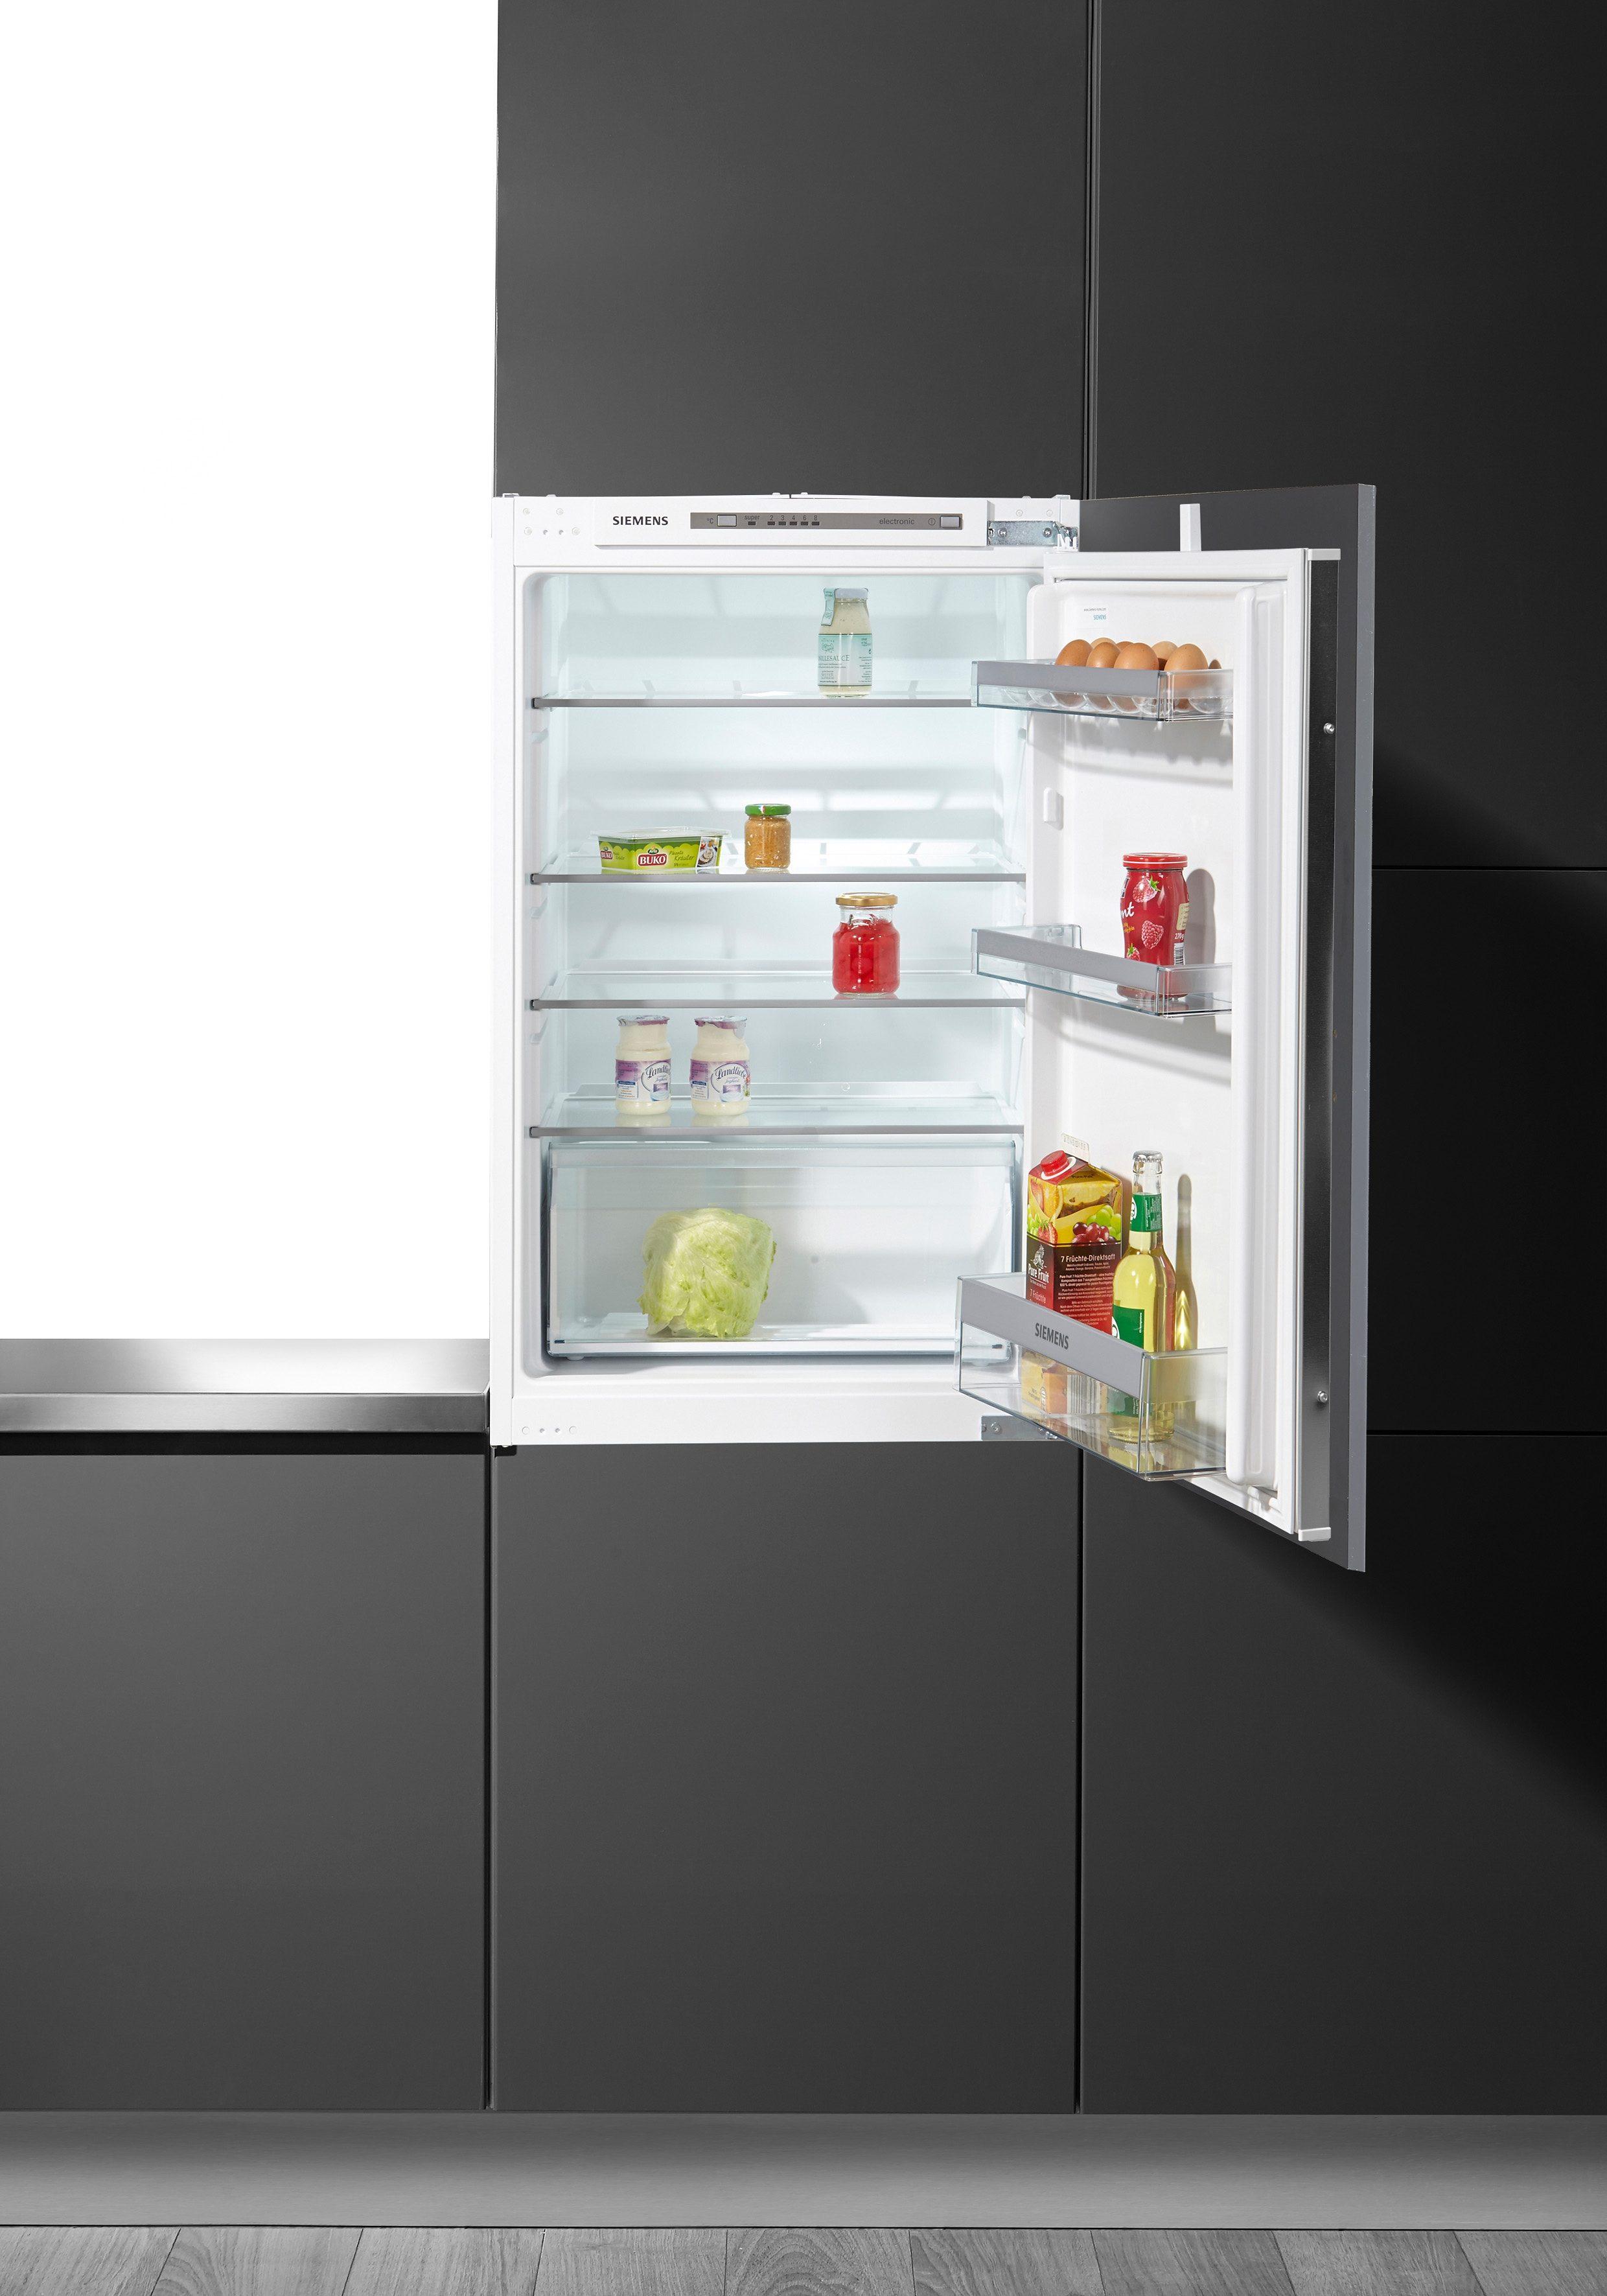 Siemens Einbau-Kühlautomat KI21RVS30, A++, 87,4 cm hoch